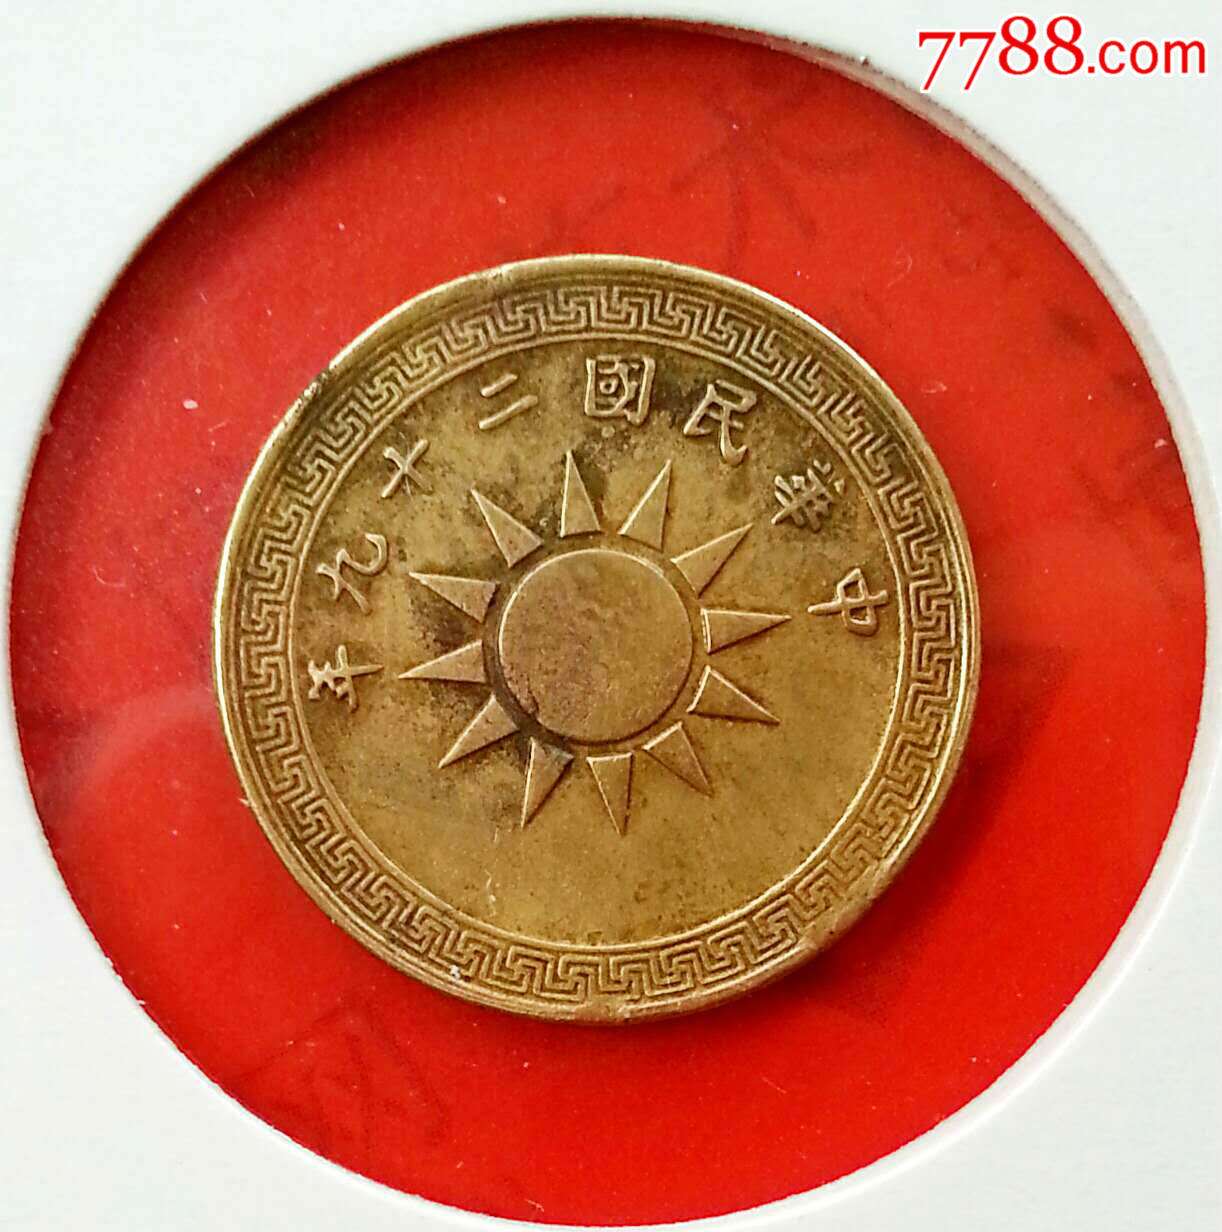 民国.党徽.29年.二分.古布.黄铜(2238)(se45323351)_